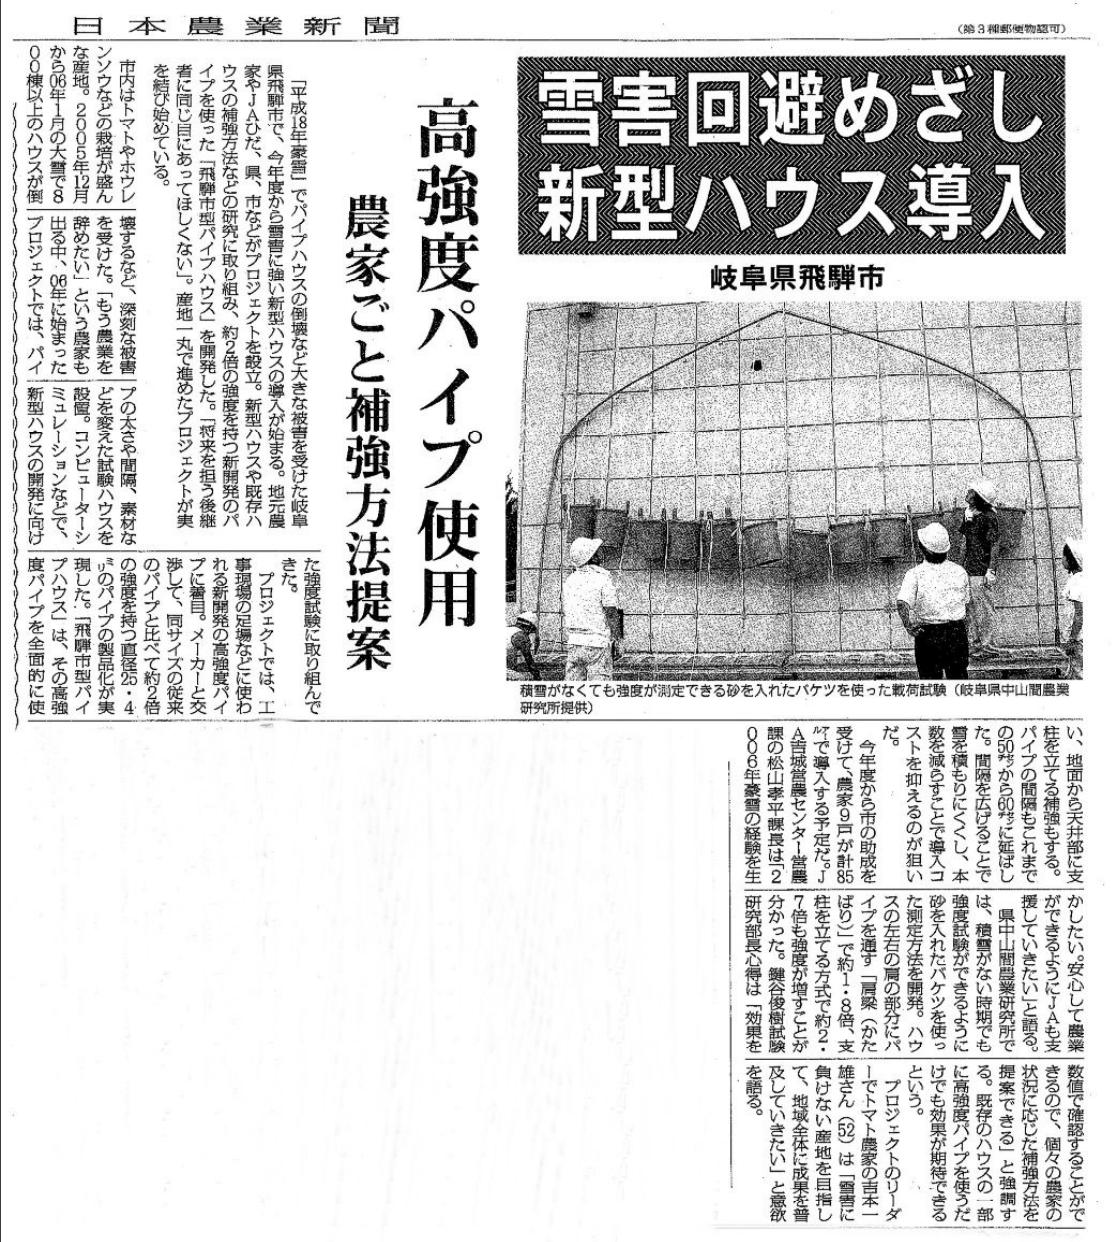 [JP][Blog]中山間研究所新聞記事